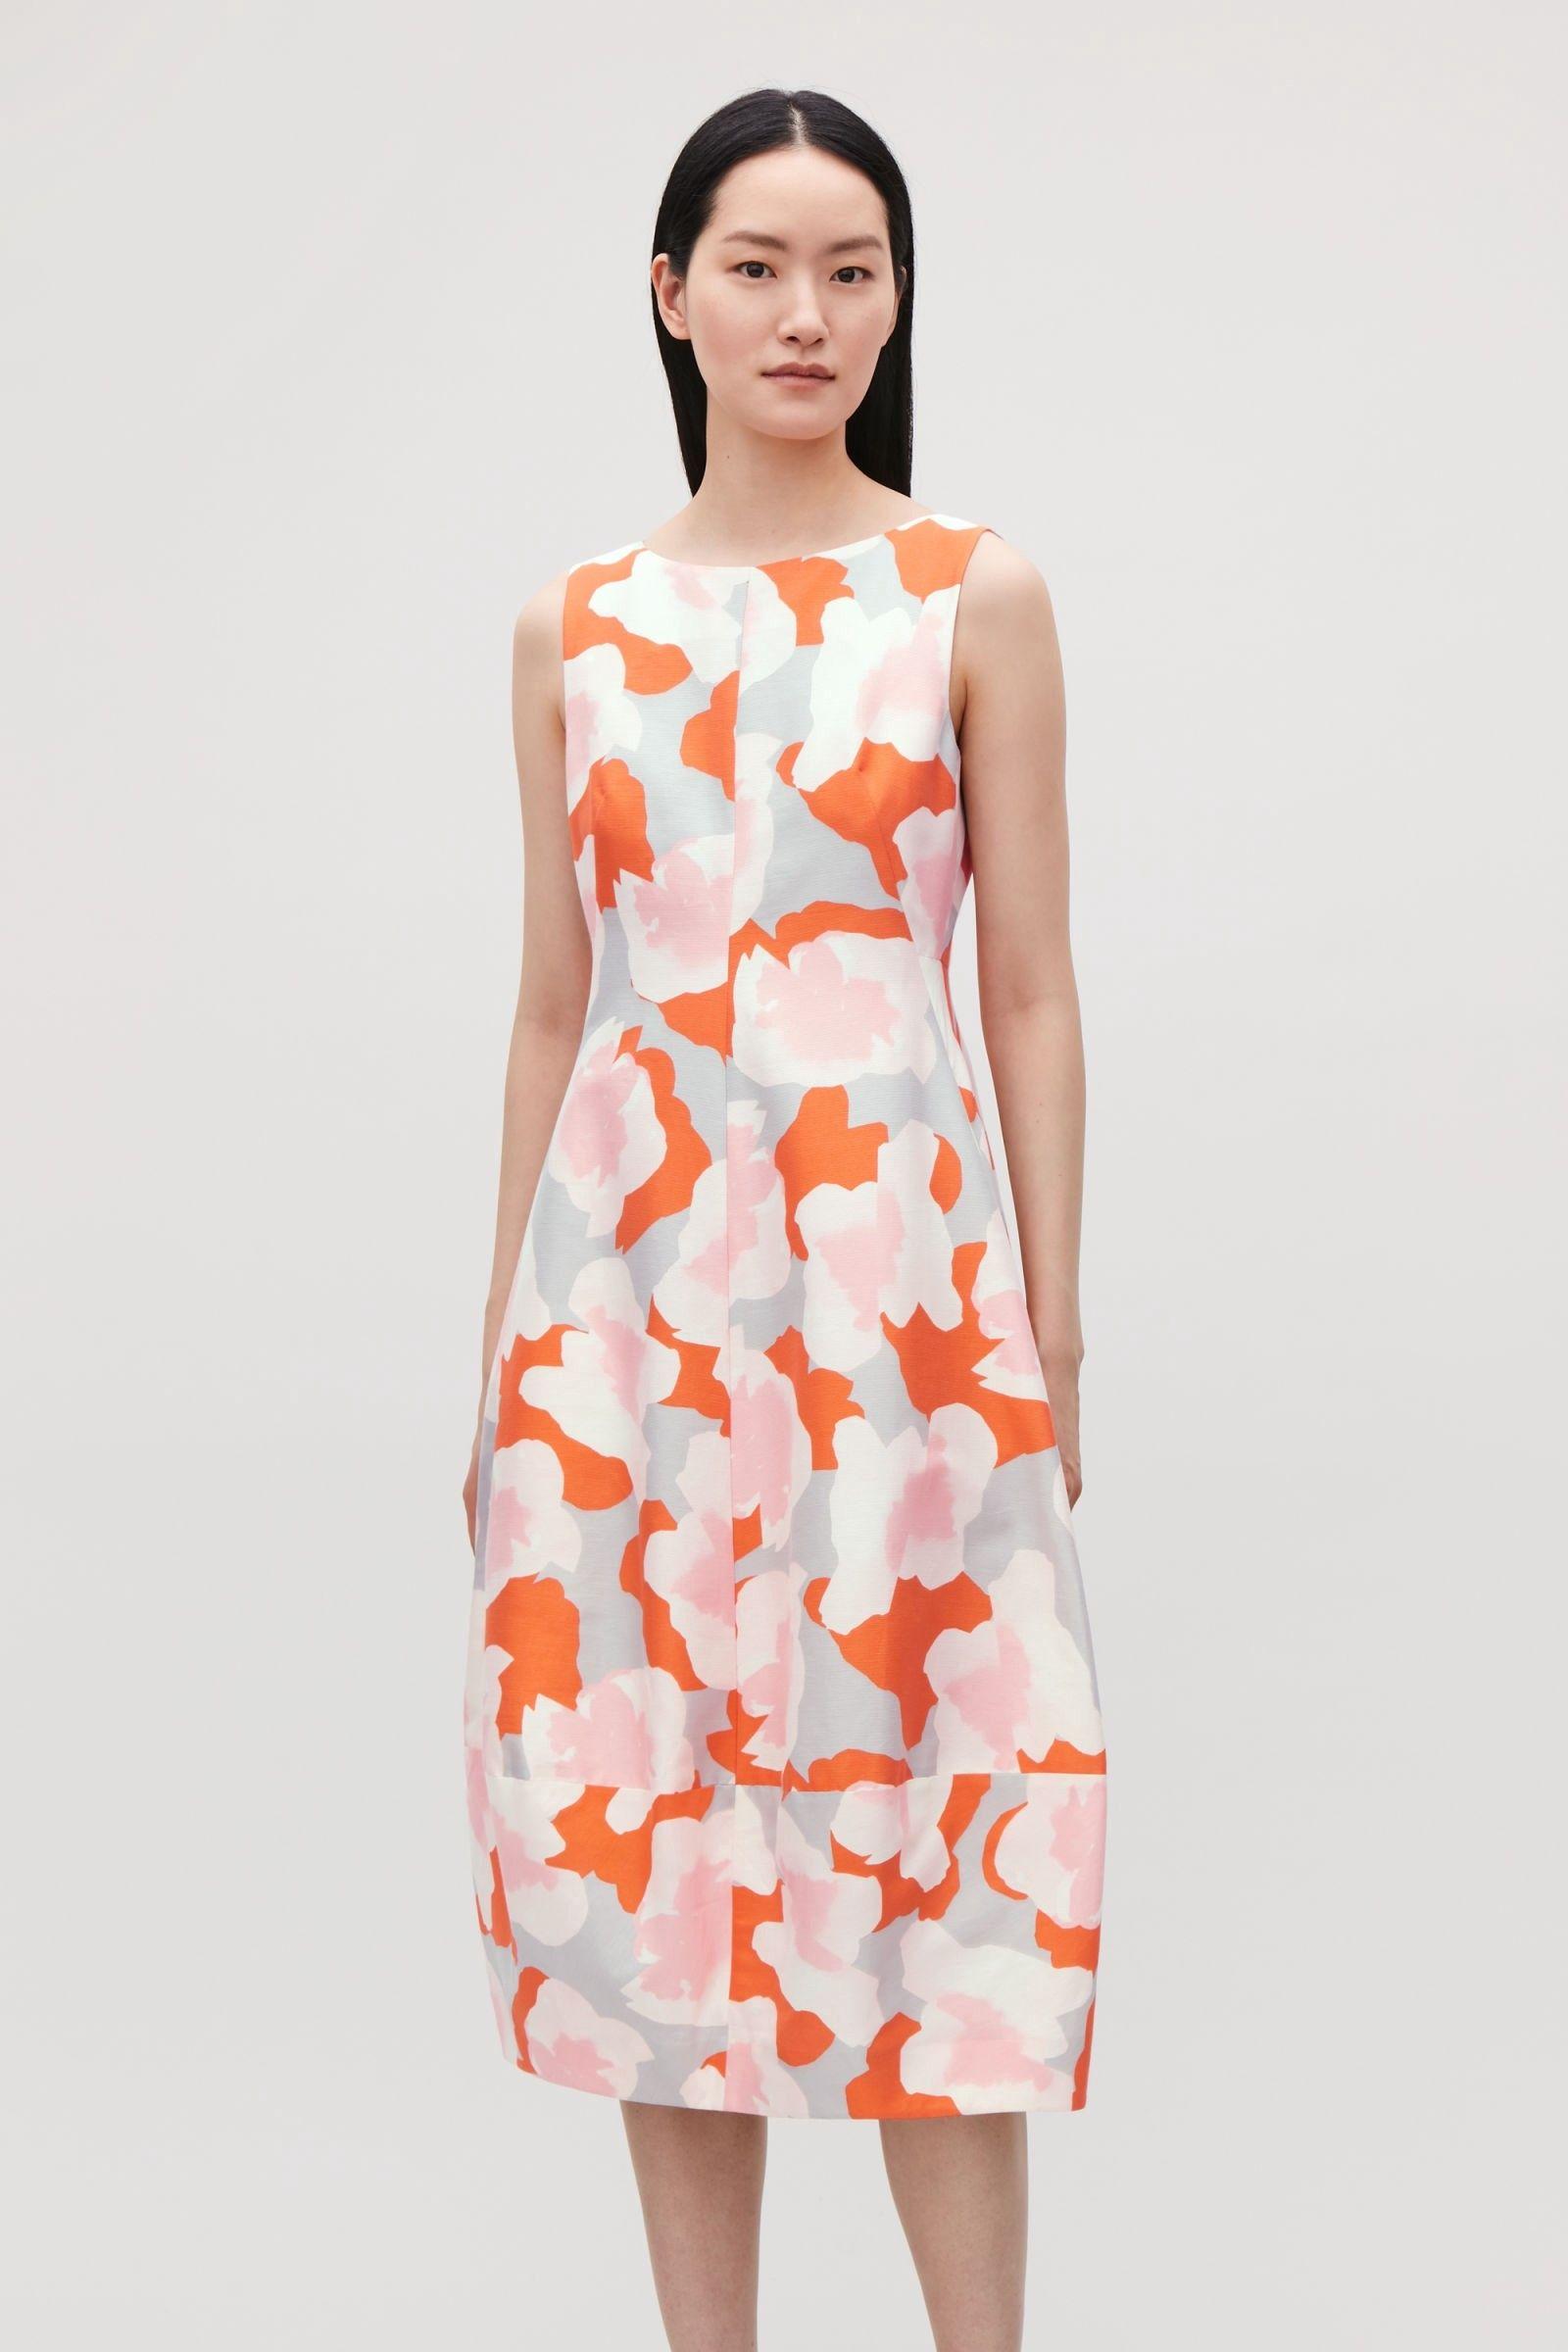 3269c9c0f Cos Printed Cocoon Dress - Orange / Pink Grey 12   Products ...